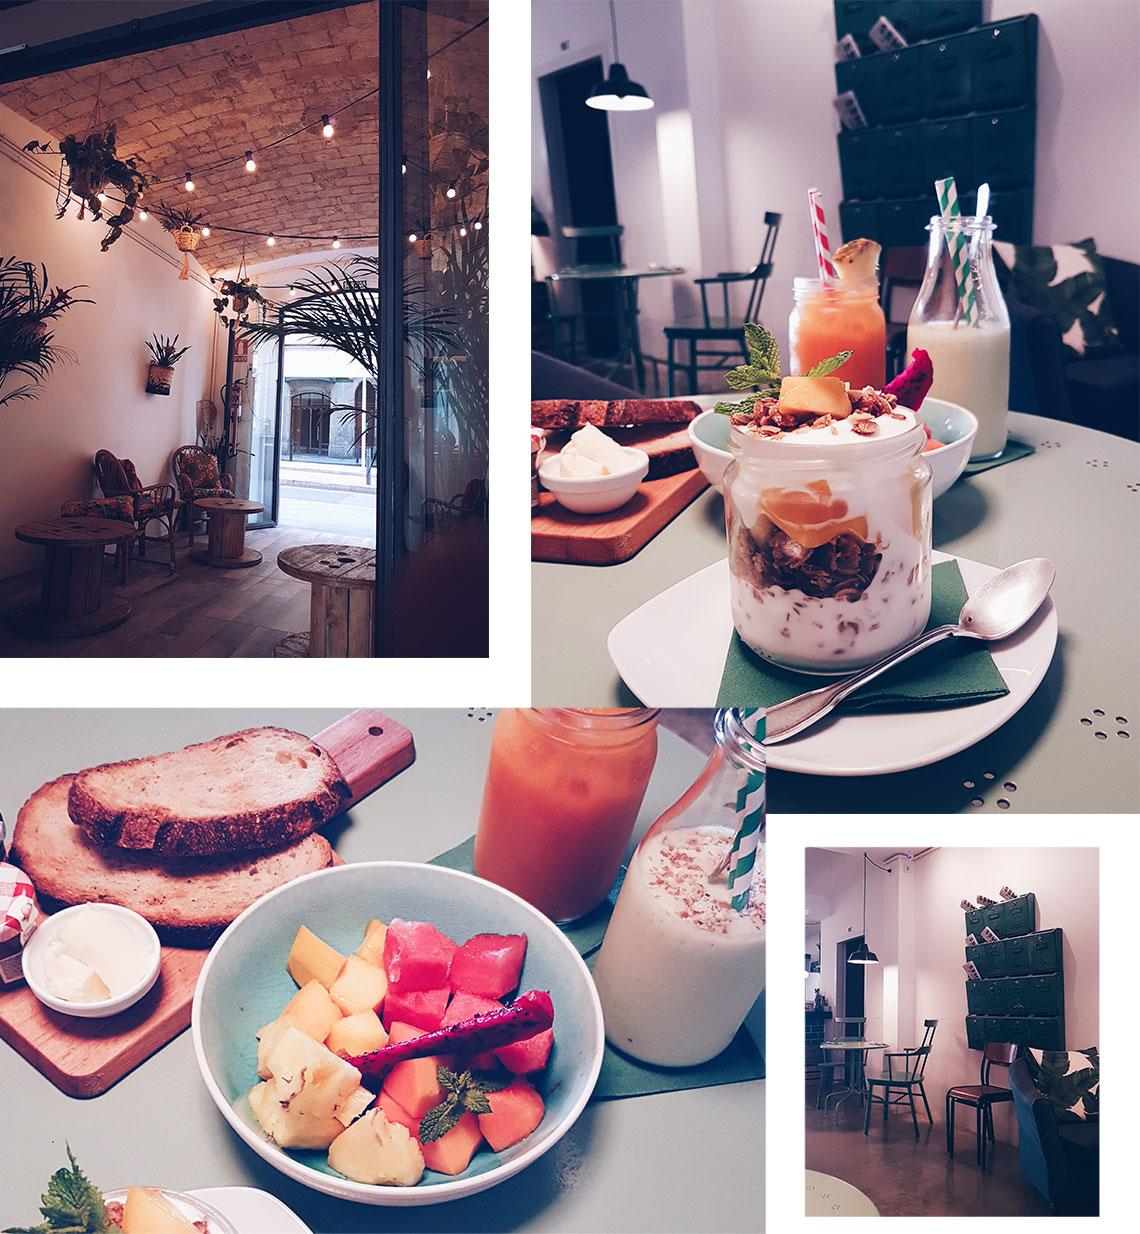 Barcelona Restaurant Tipp: Frühstück im Tropico